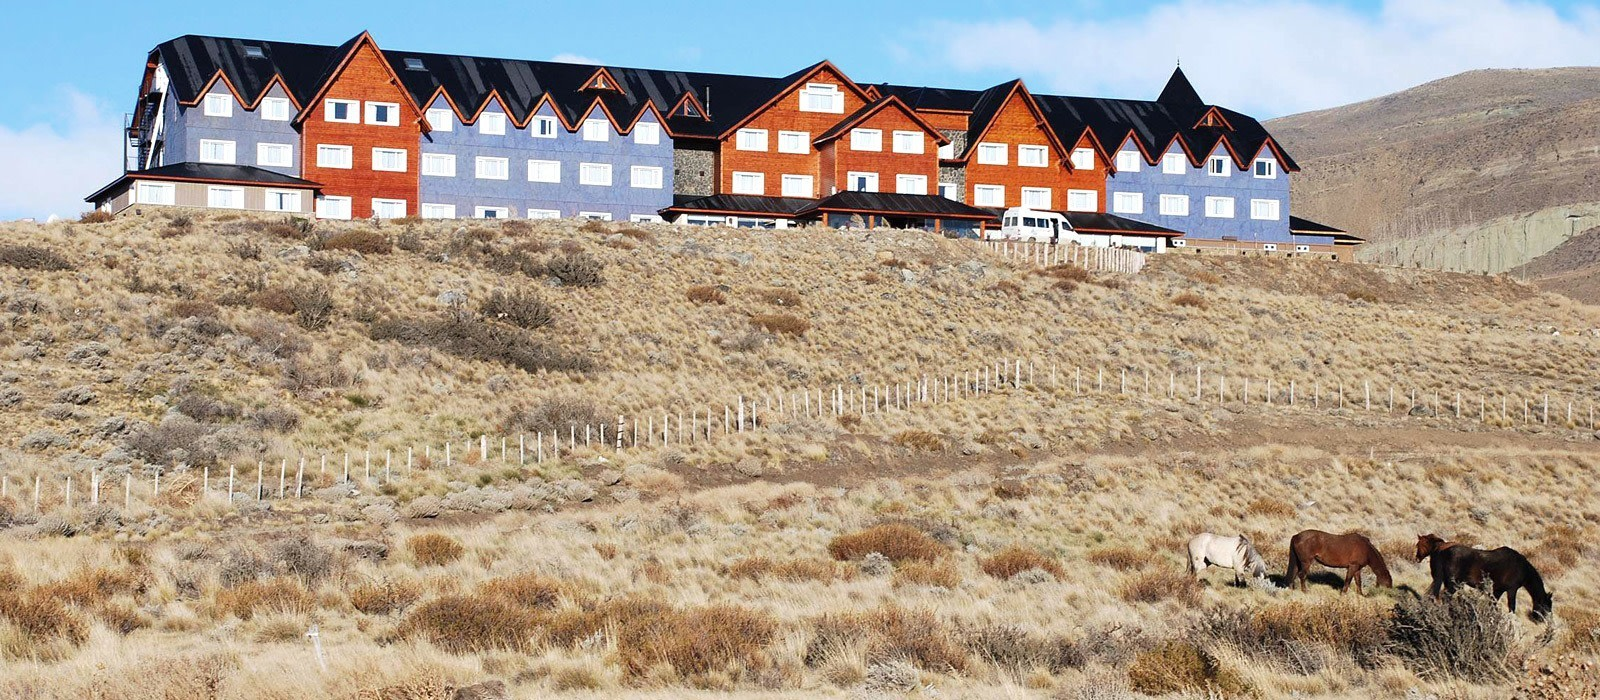 Hotel Alto Calafate Argentina